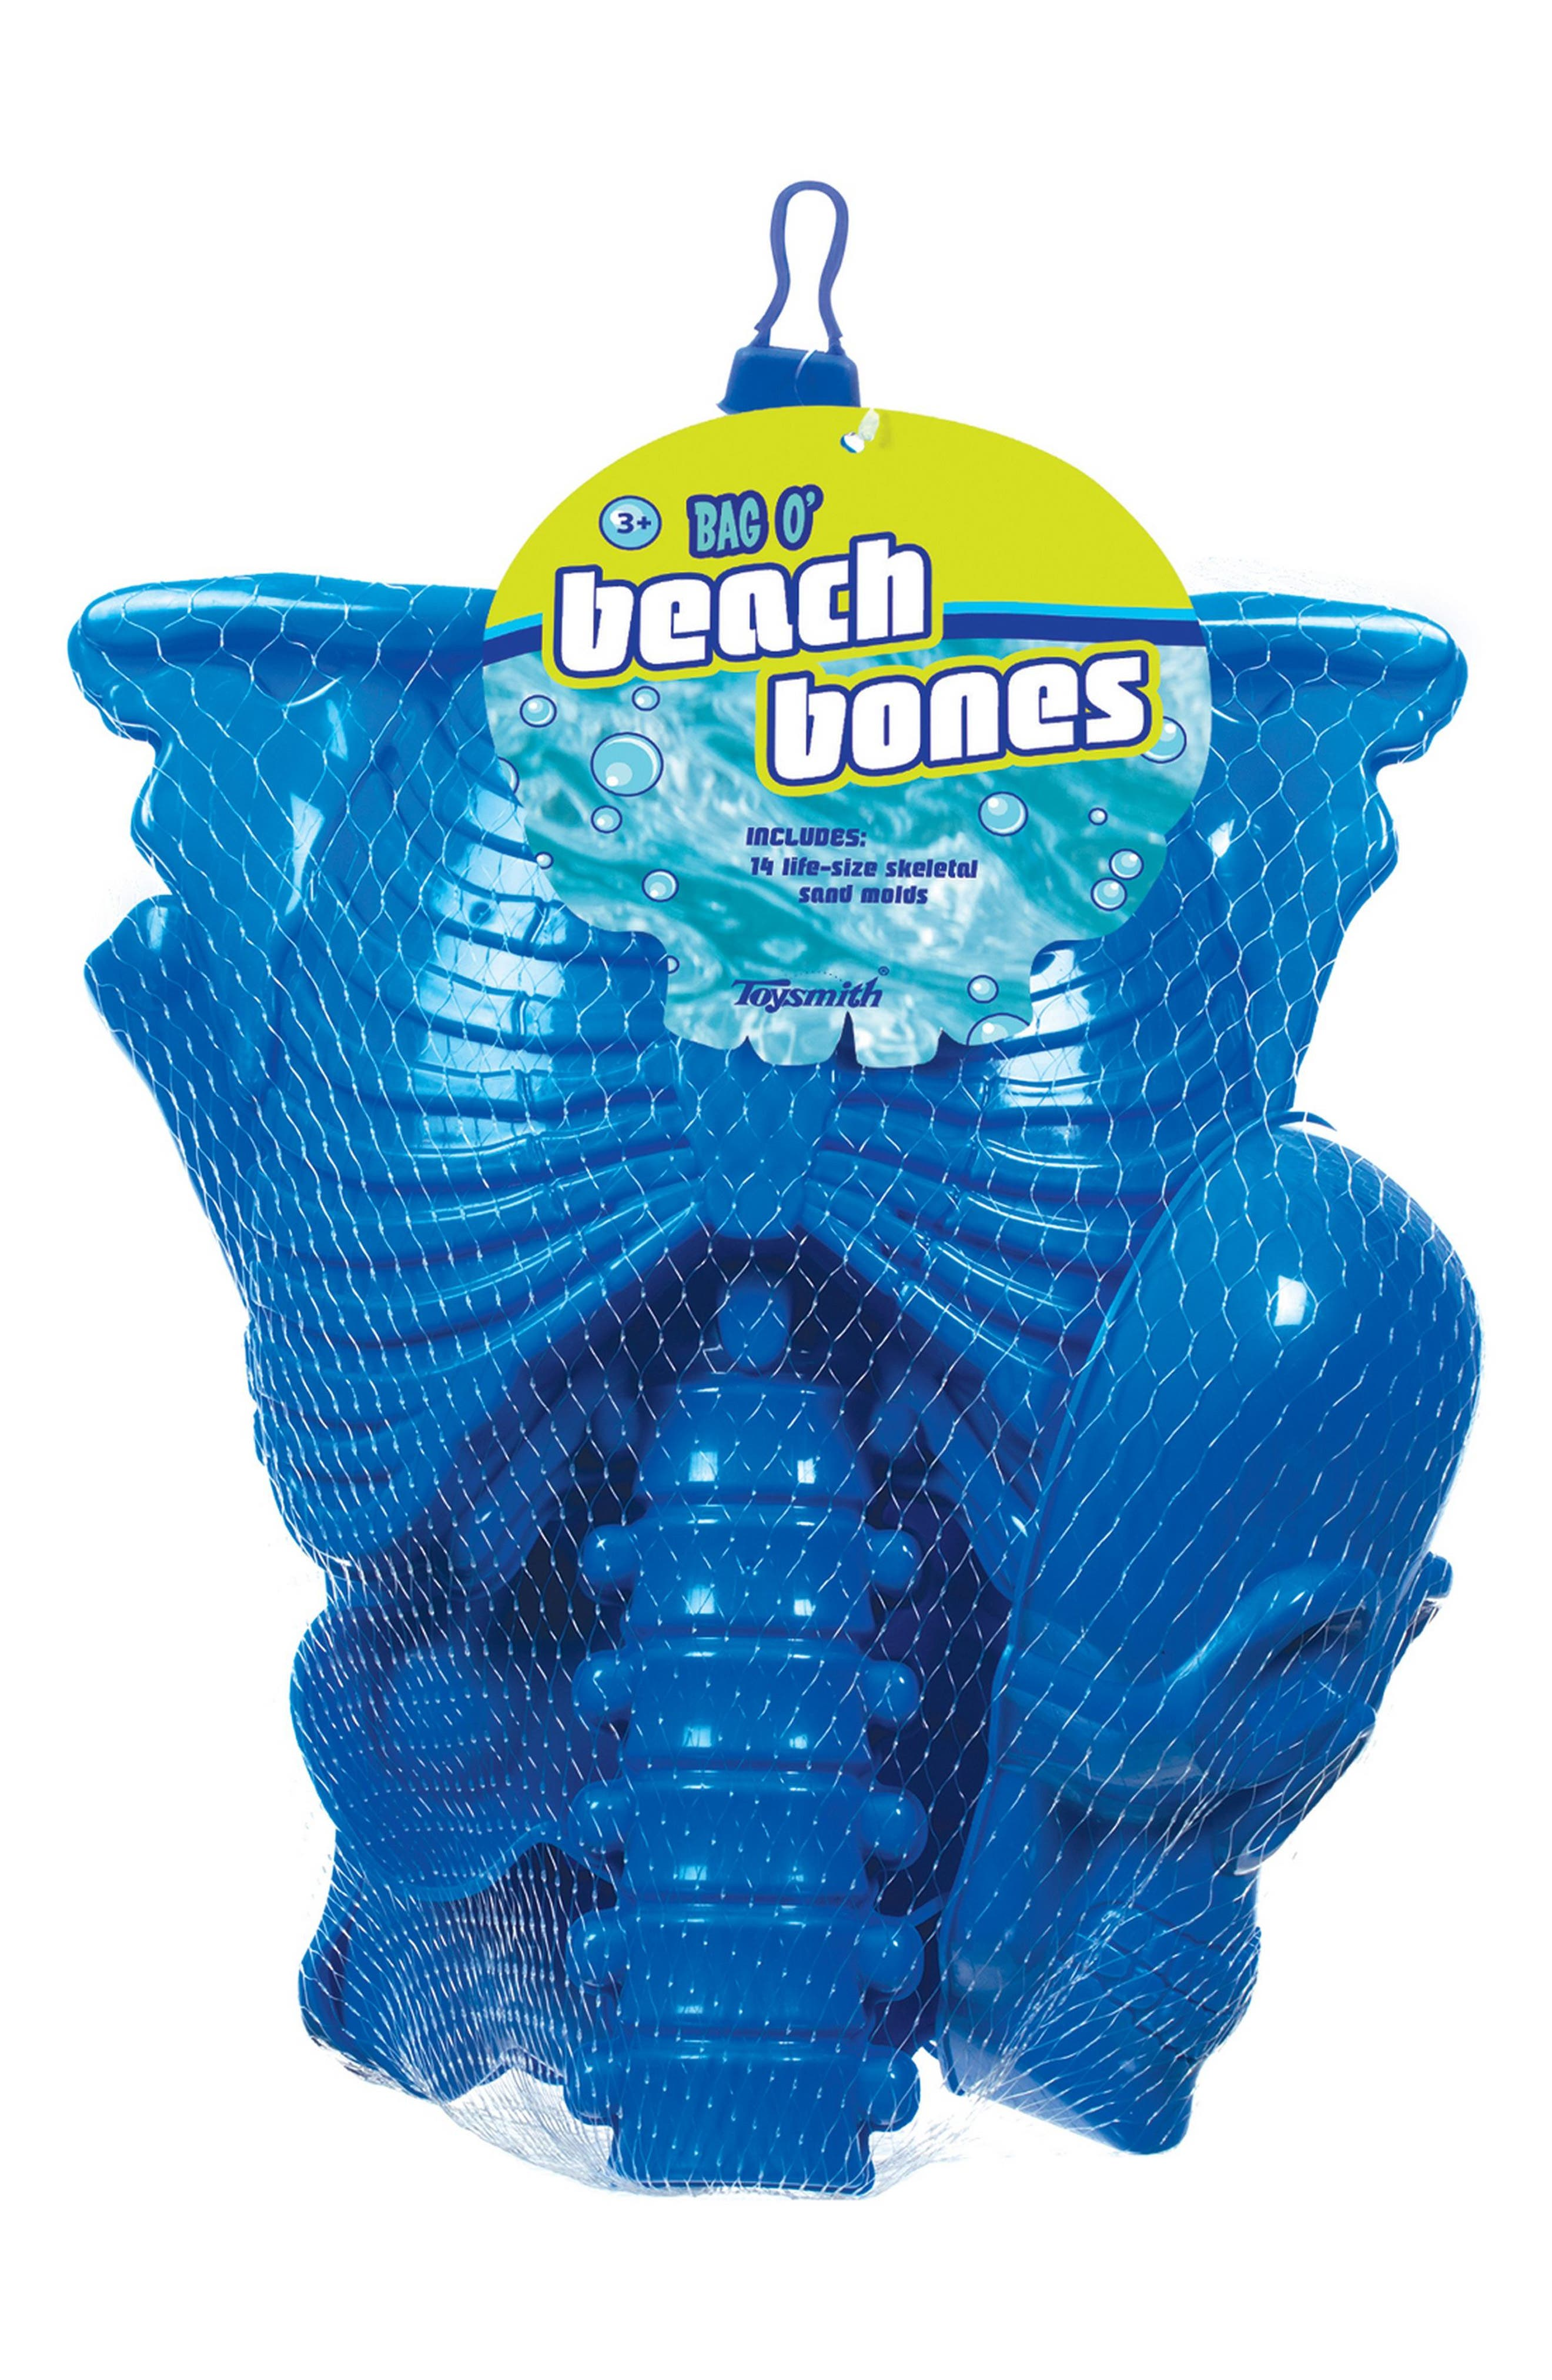 Bag O' Beach Bones Beach Toy Kit,                             Main thumbnail 1, color,                             400